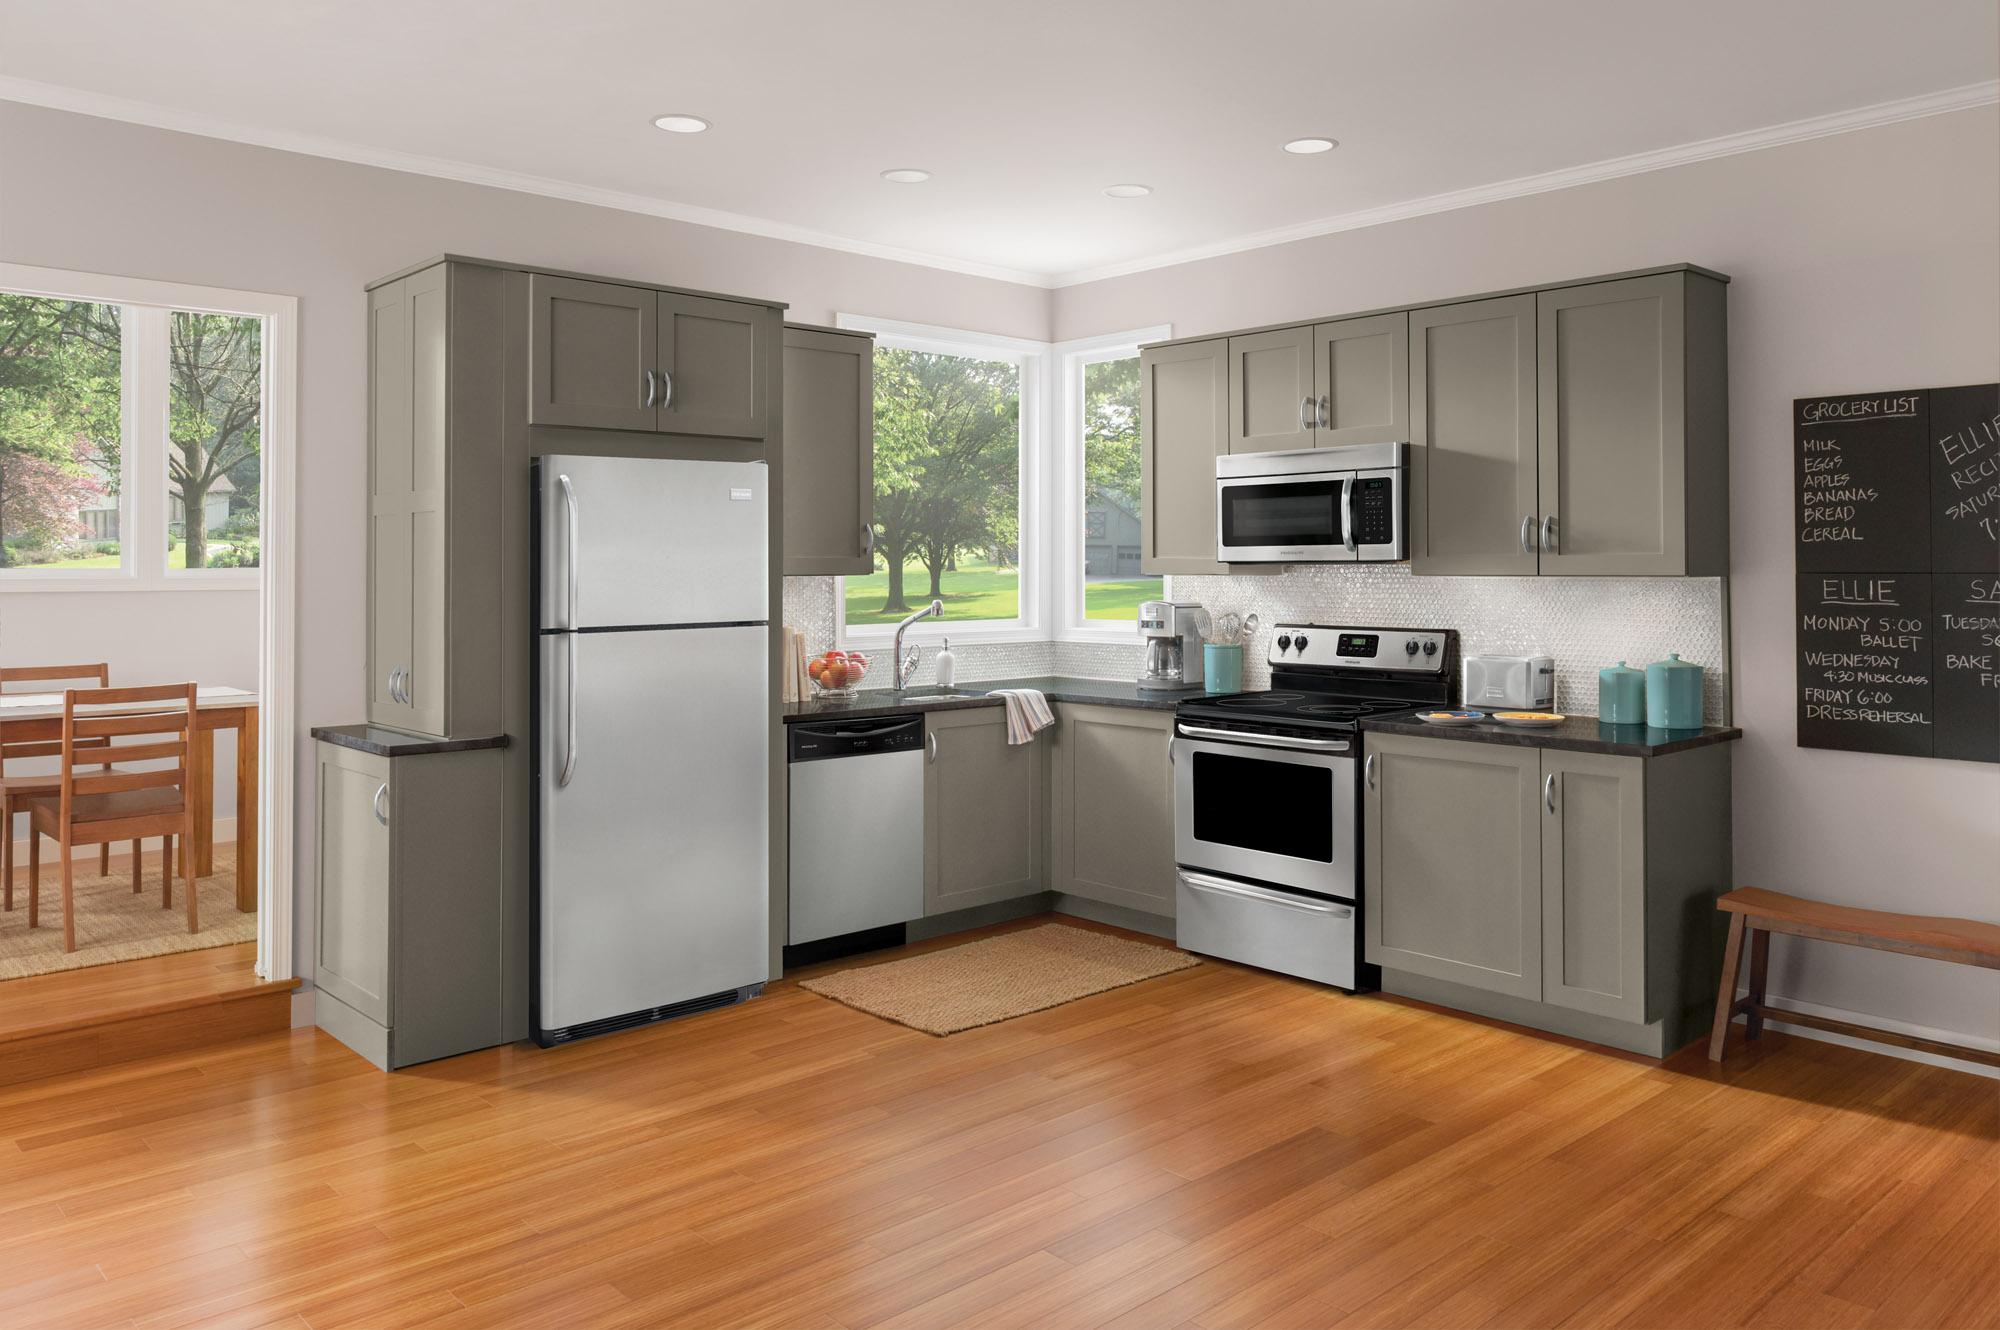 Uncategorized Wholesale Kitchen Appliance Packages appliance package deals nowappliance com